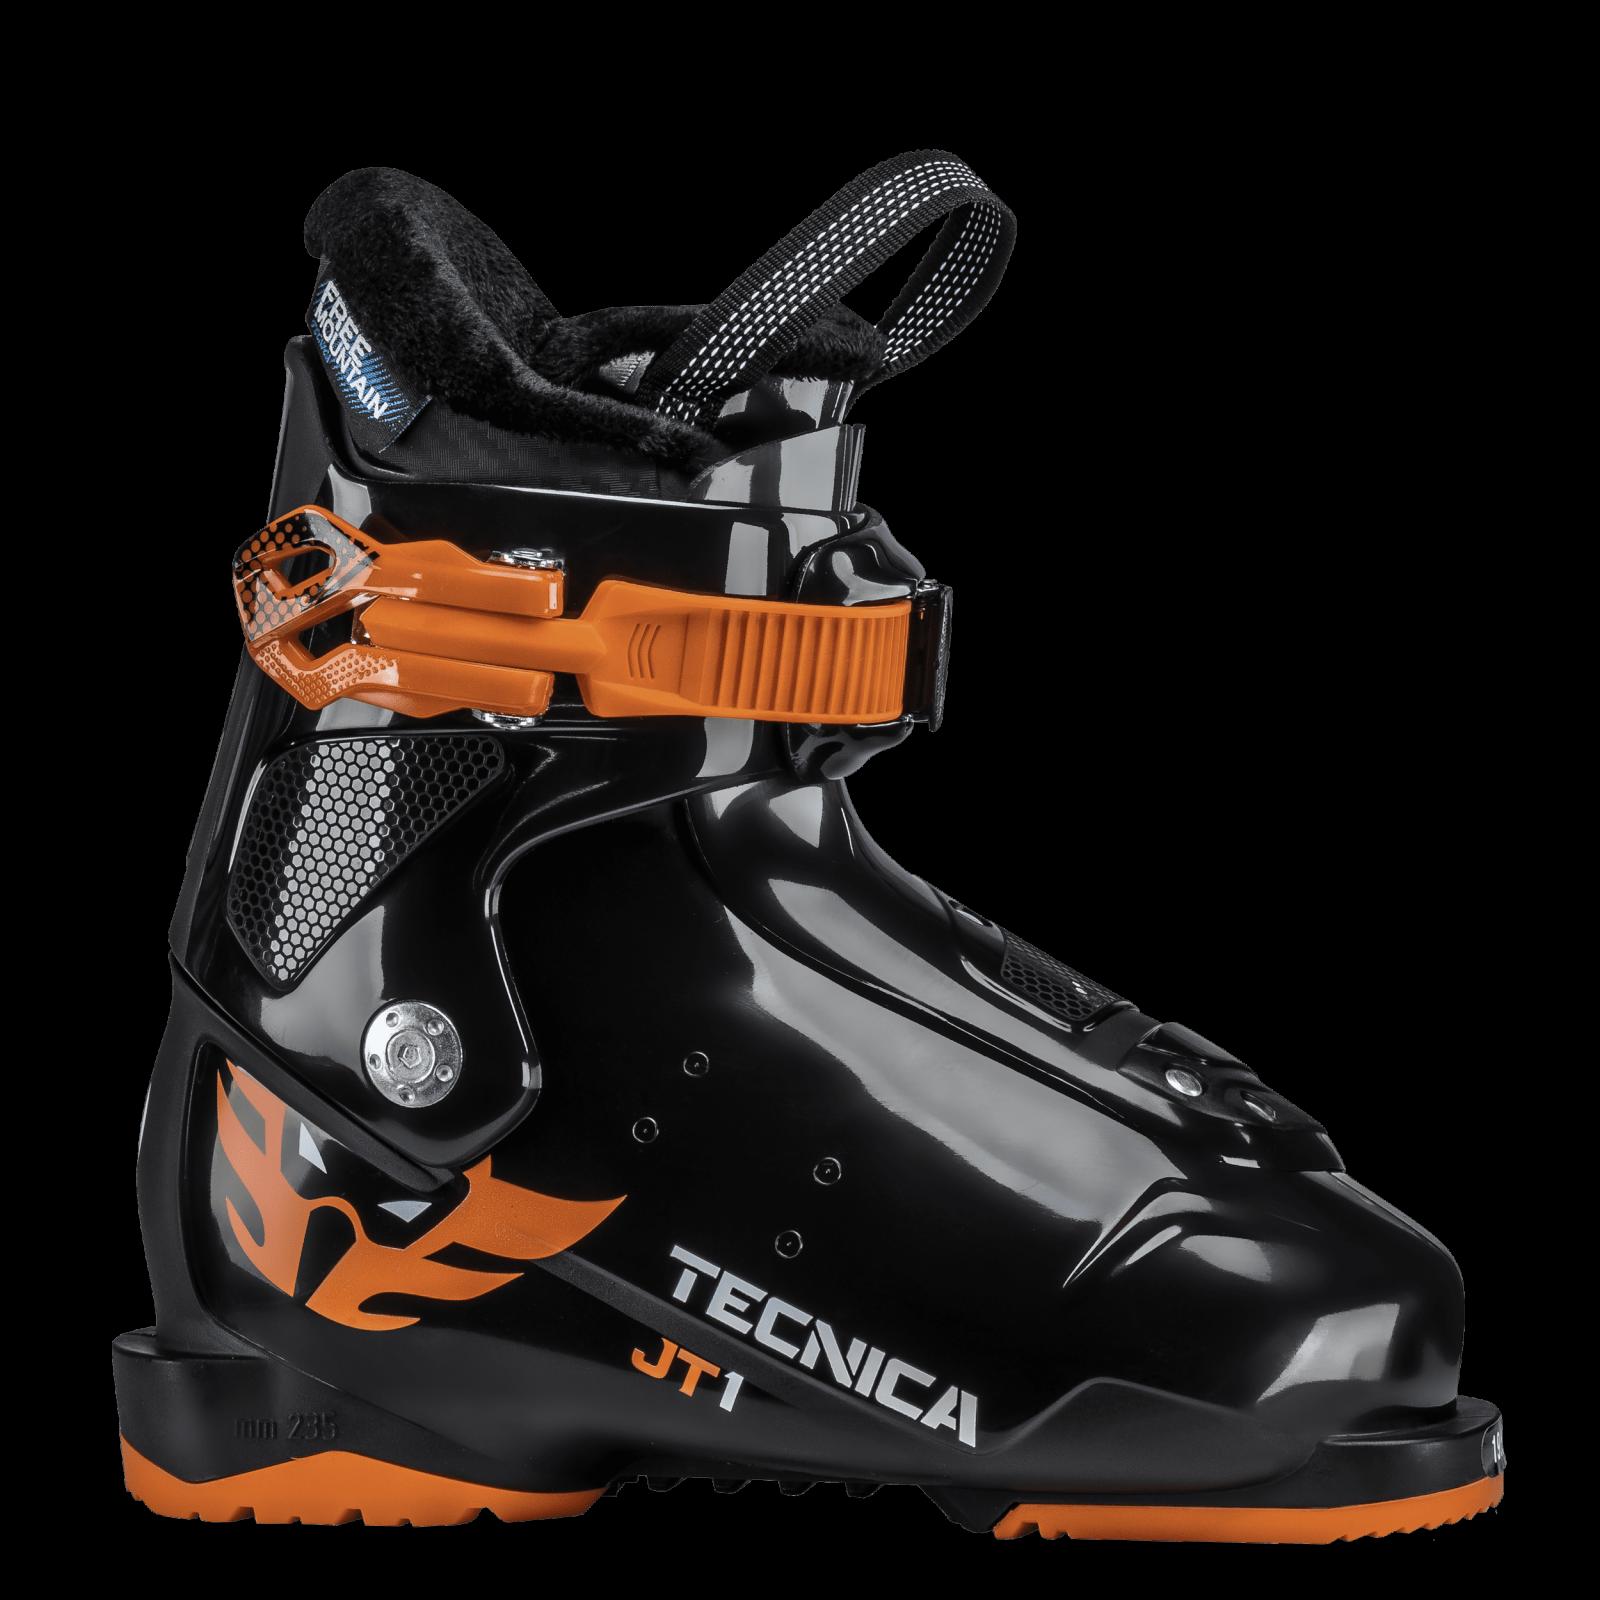 2020 Tecnica JT 1 Cochise Youth Ski Boots